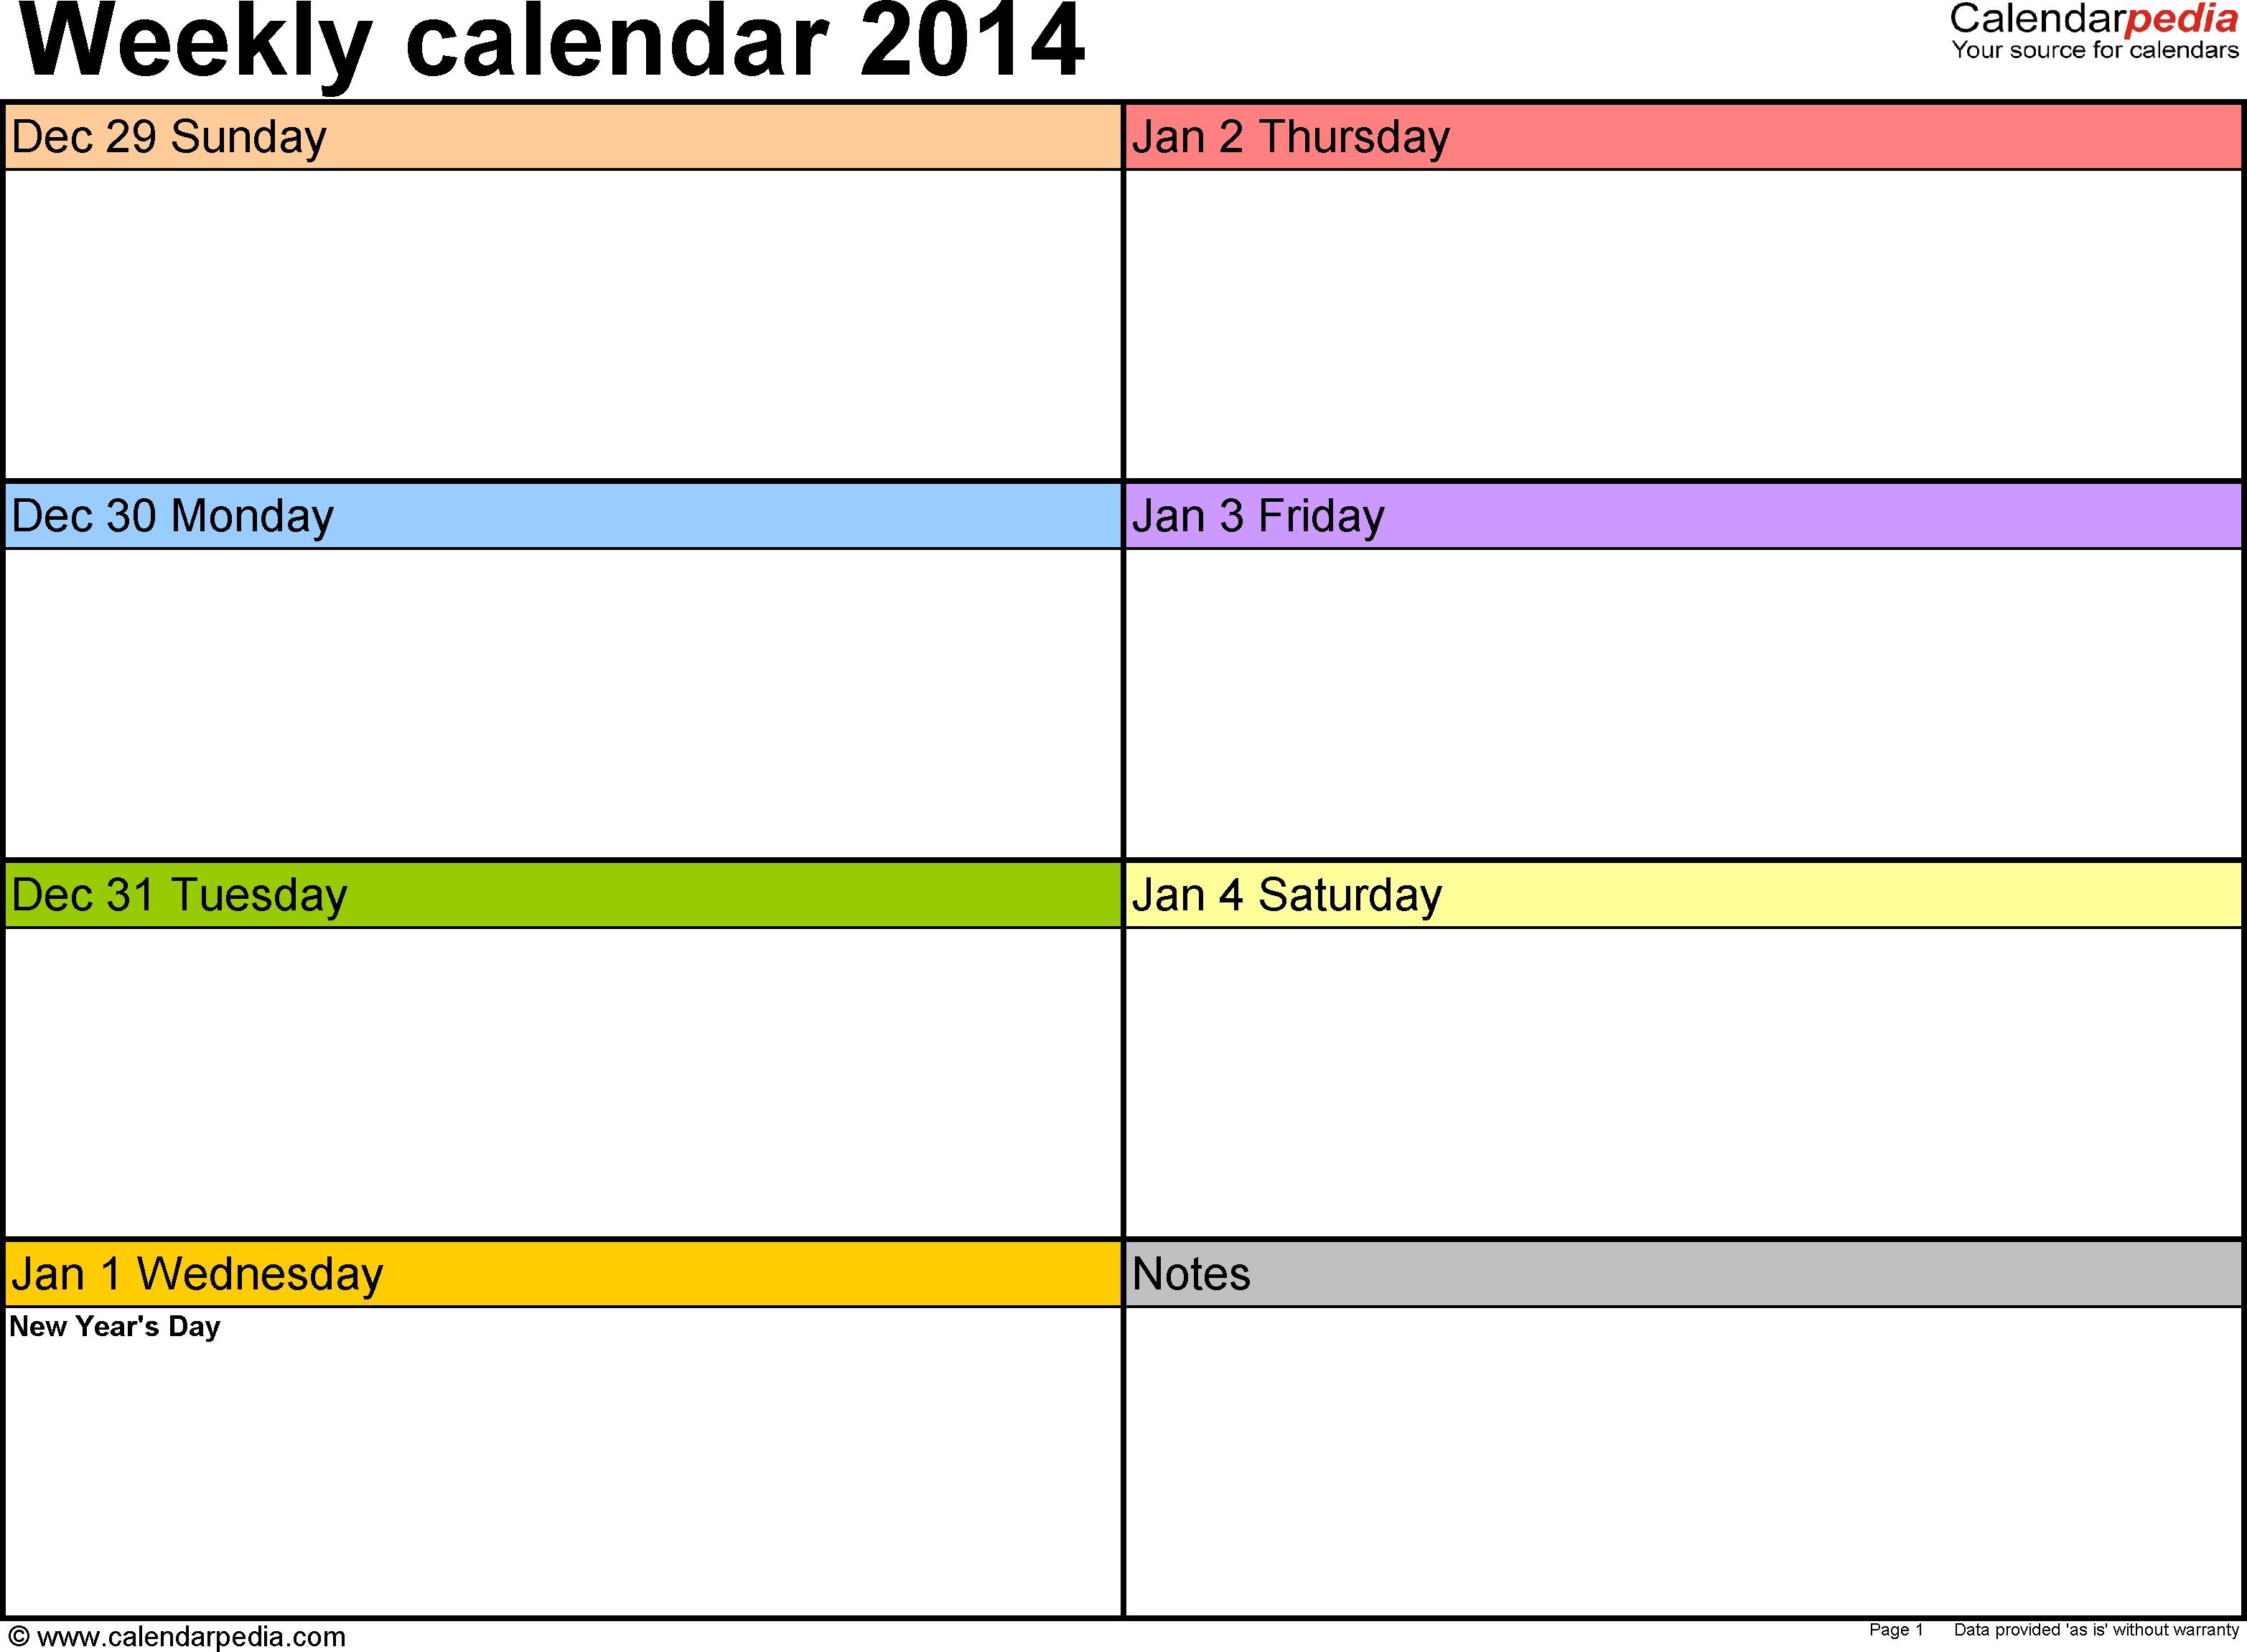 Weekly Calendar 2014 For Pdf 4 Free Printable Templates  Xjb